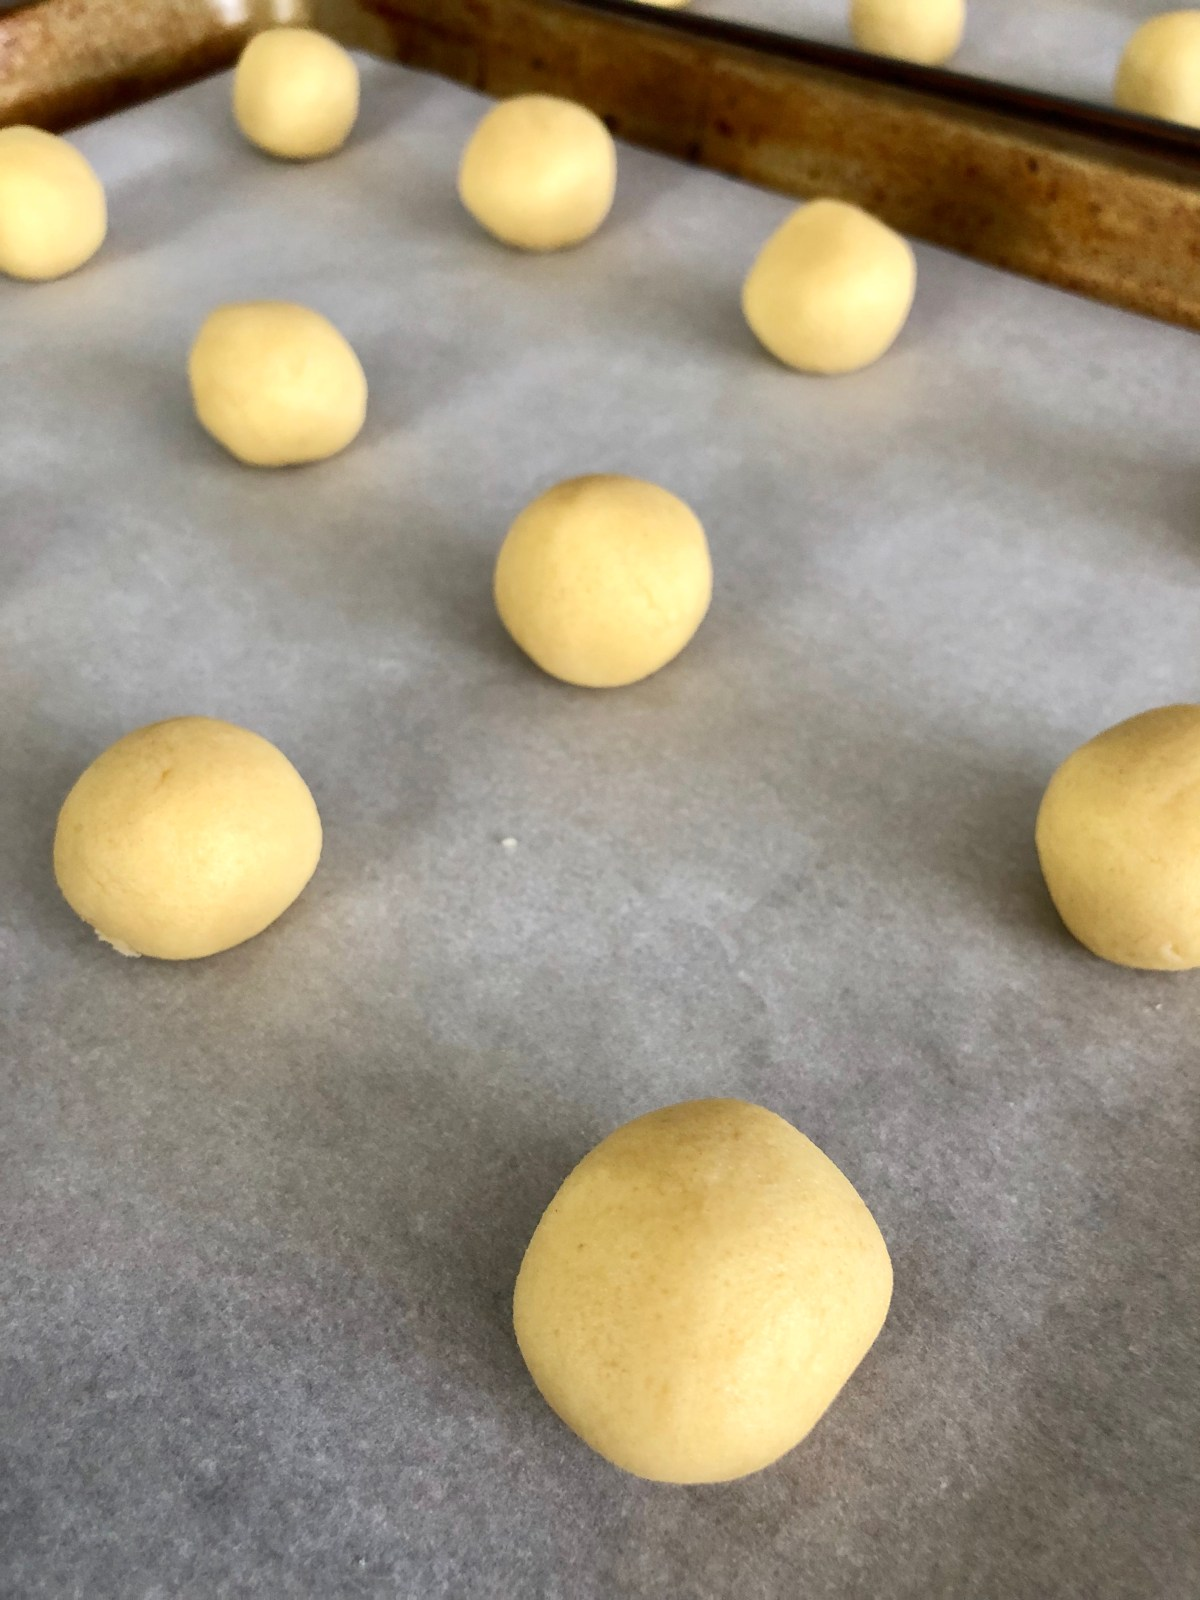 Cappuccino Swirl Cookies by Happylifeblogspot.com #coffeecookies #cookies #cappuccinocookies #christmascookies #hersheykisscookies #irishcreamcookies